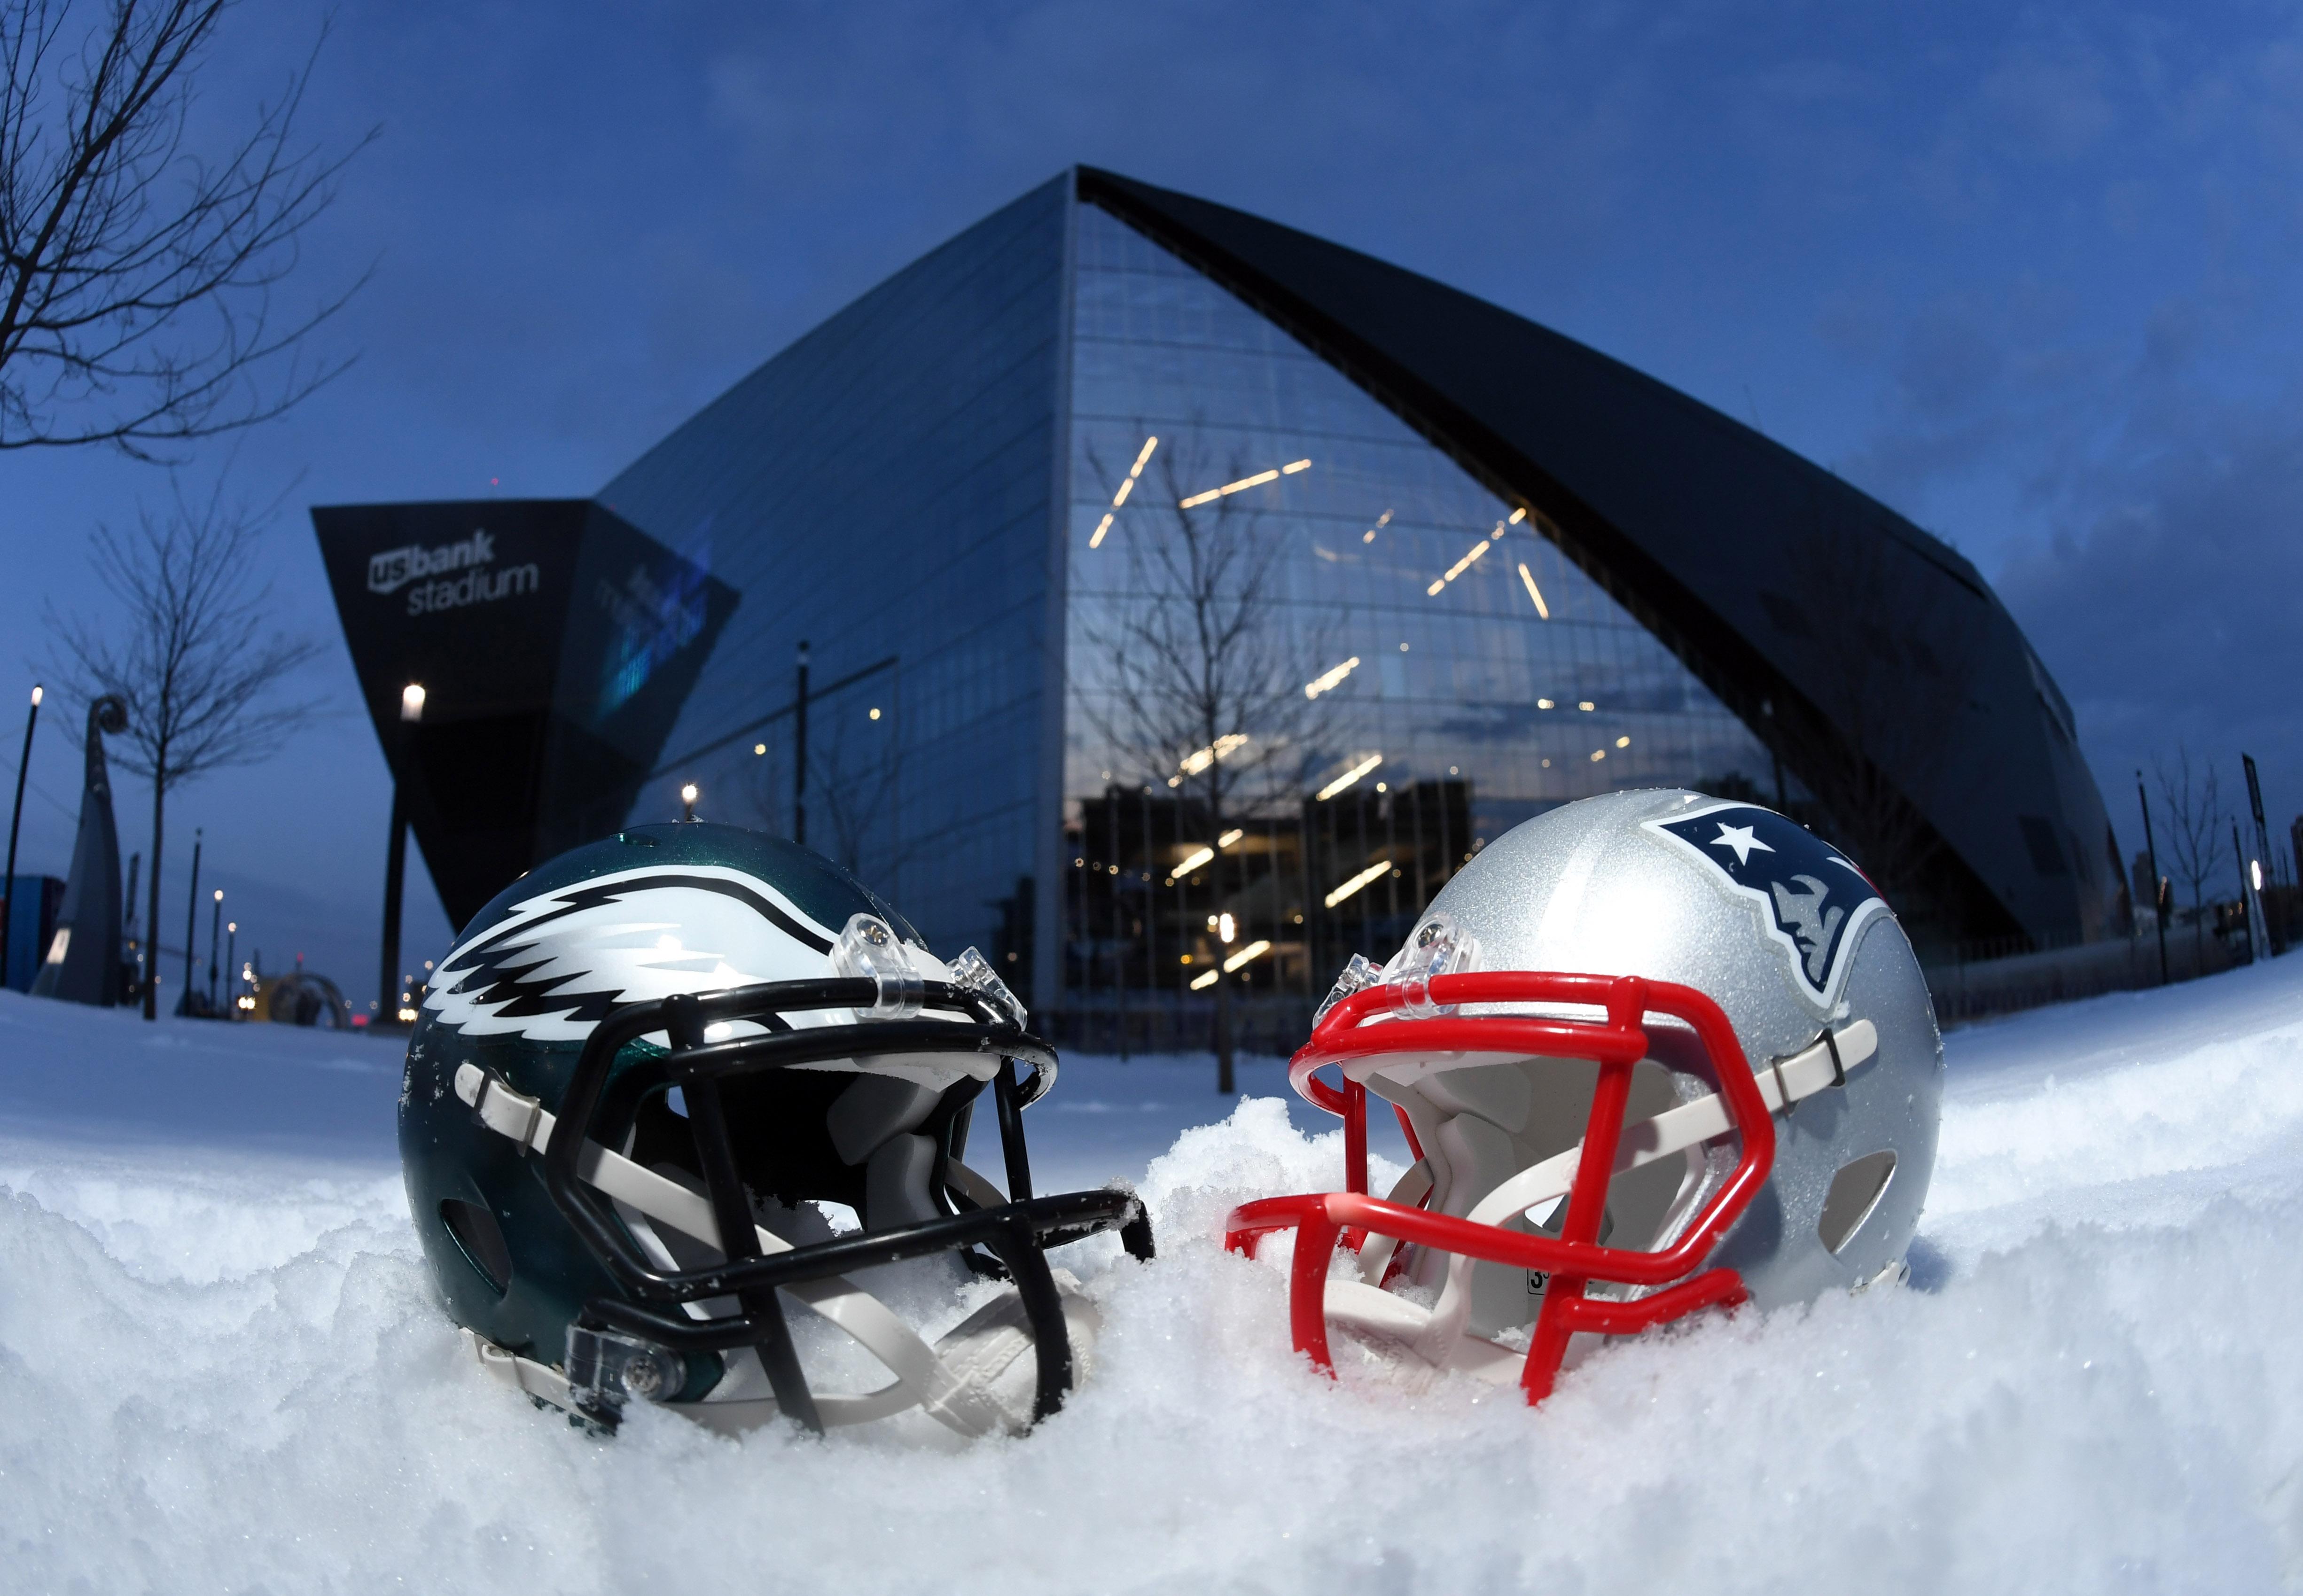 Hope and Passion vs. Mystique: An Eagles vs. Patriots Super Bowl Preview